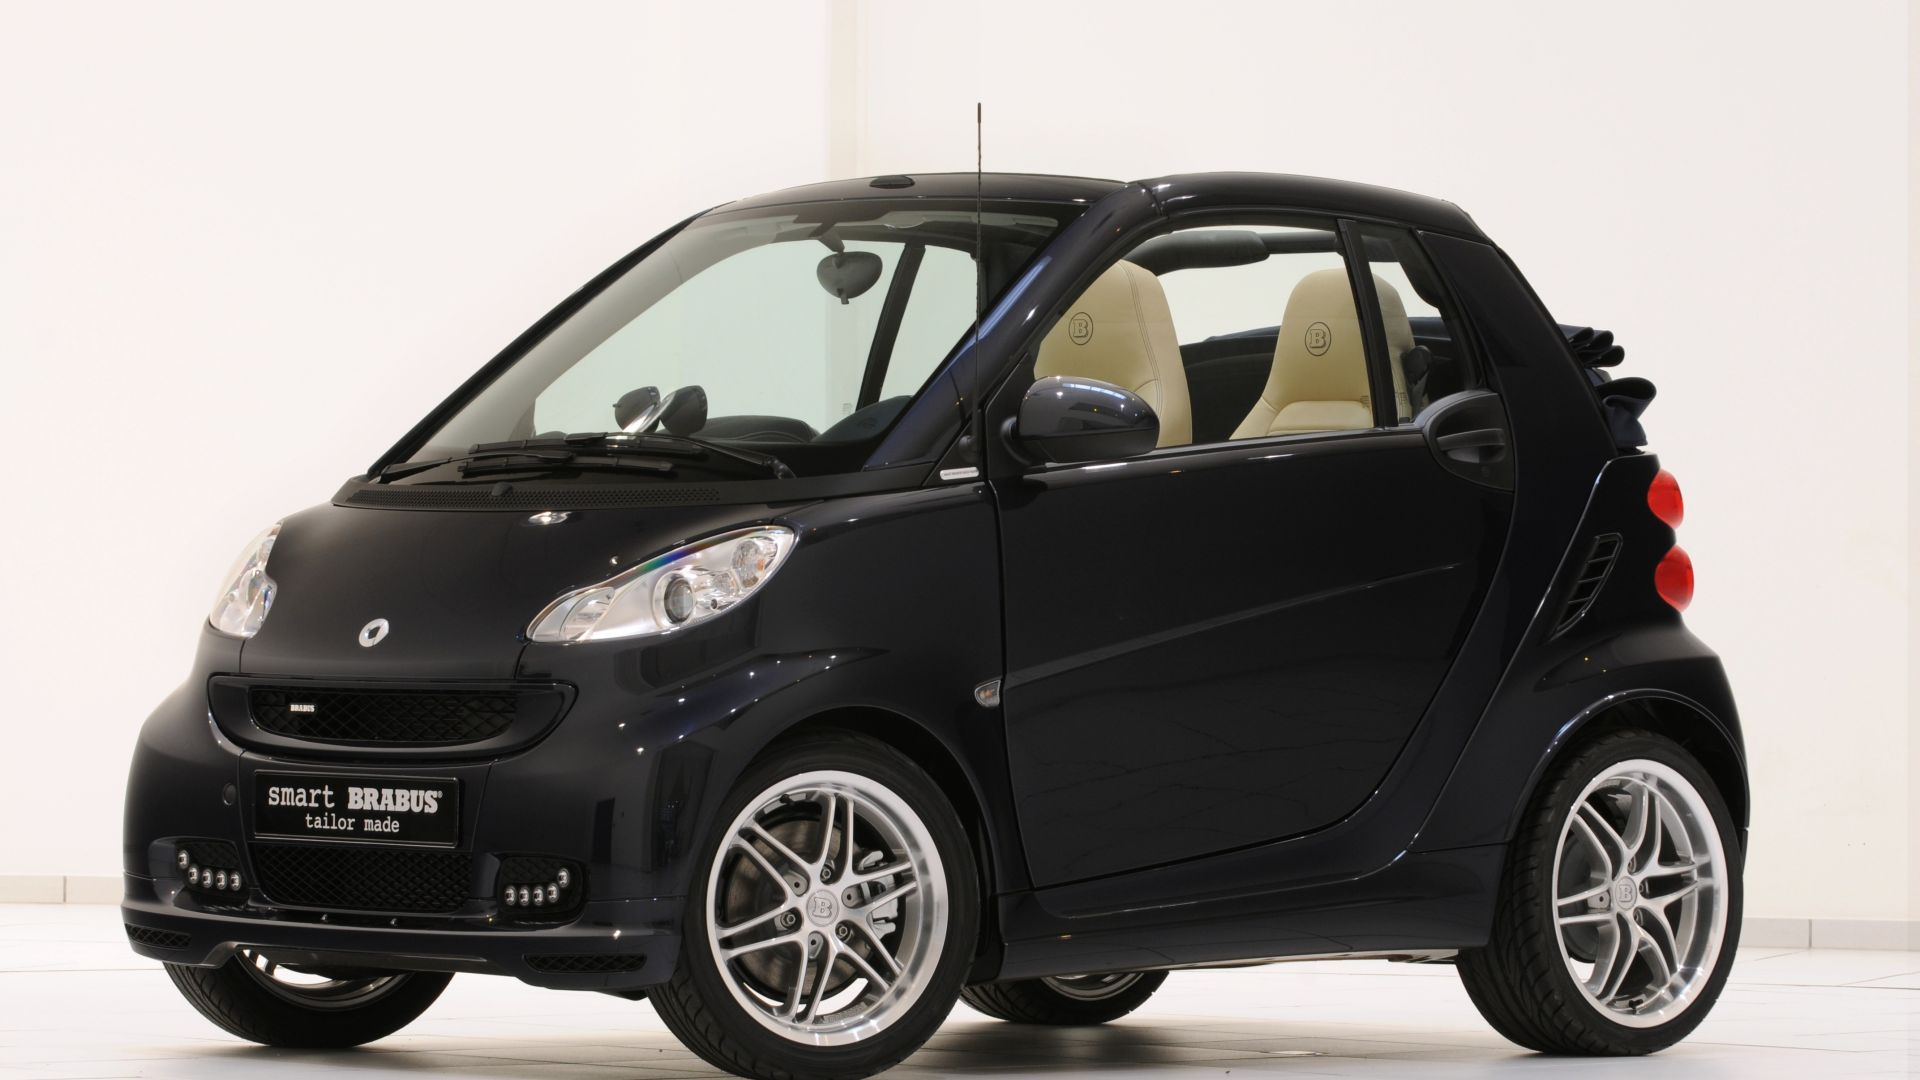 serie speciali smart fortwo cabrio brabus lableu motorbox. Black Bedroom Furniture Sets. Home Design Ideas